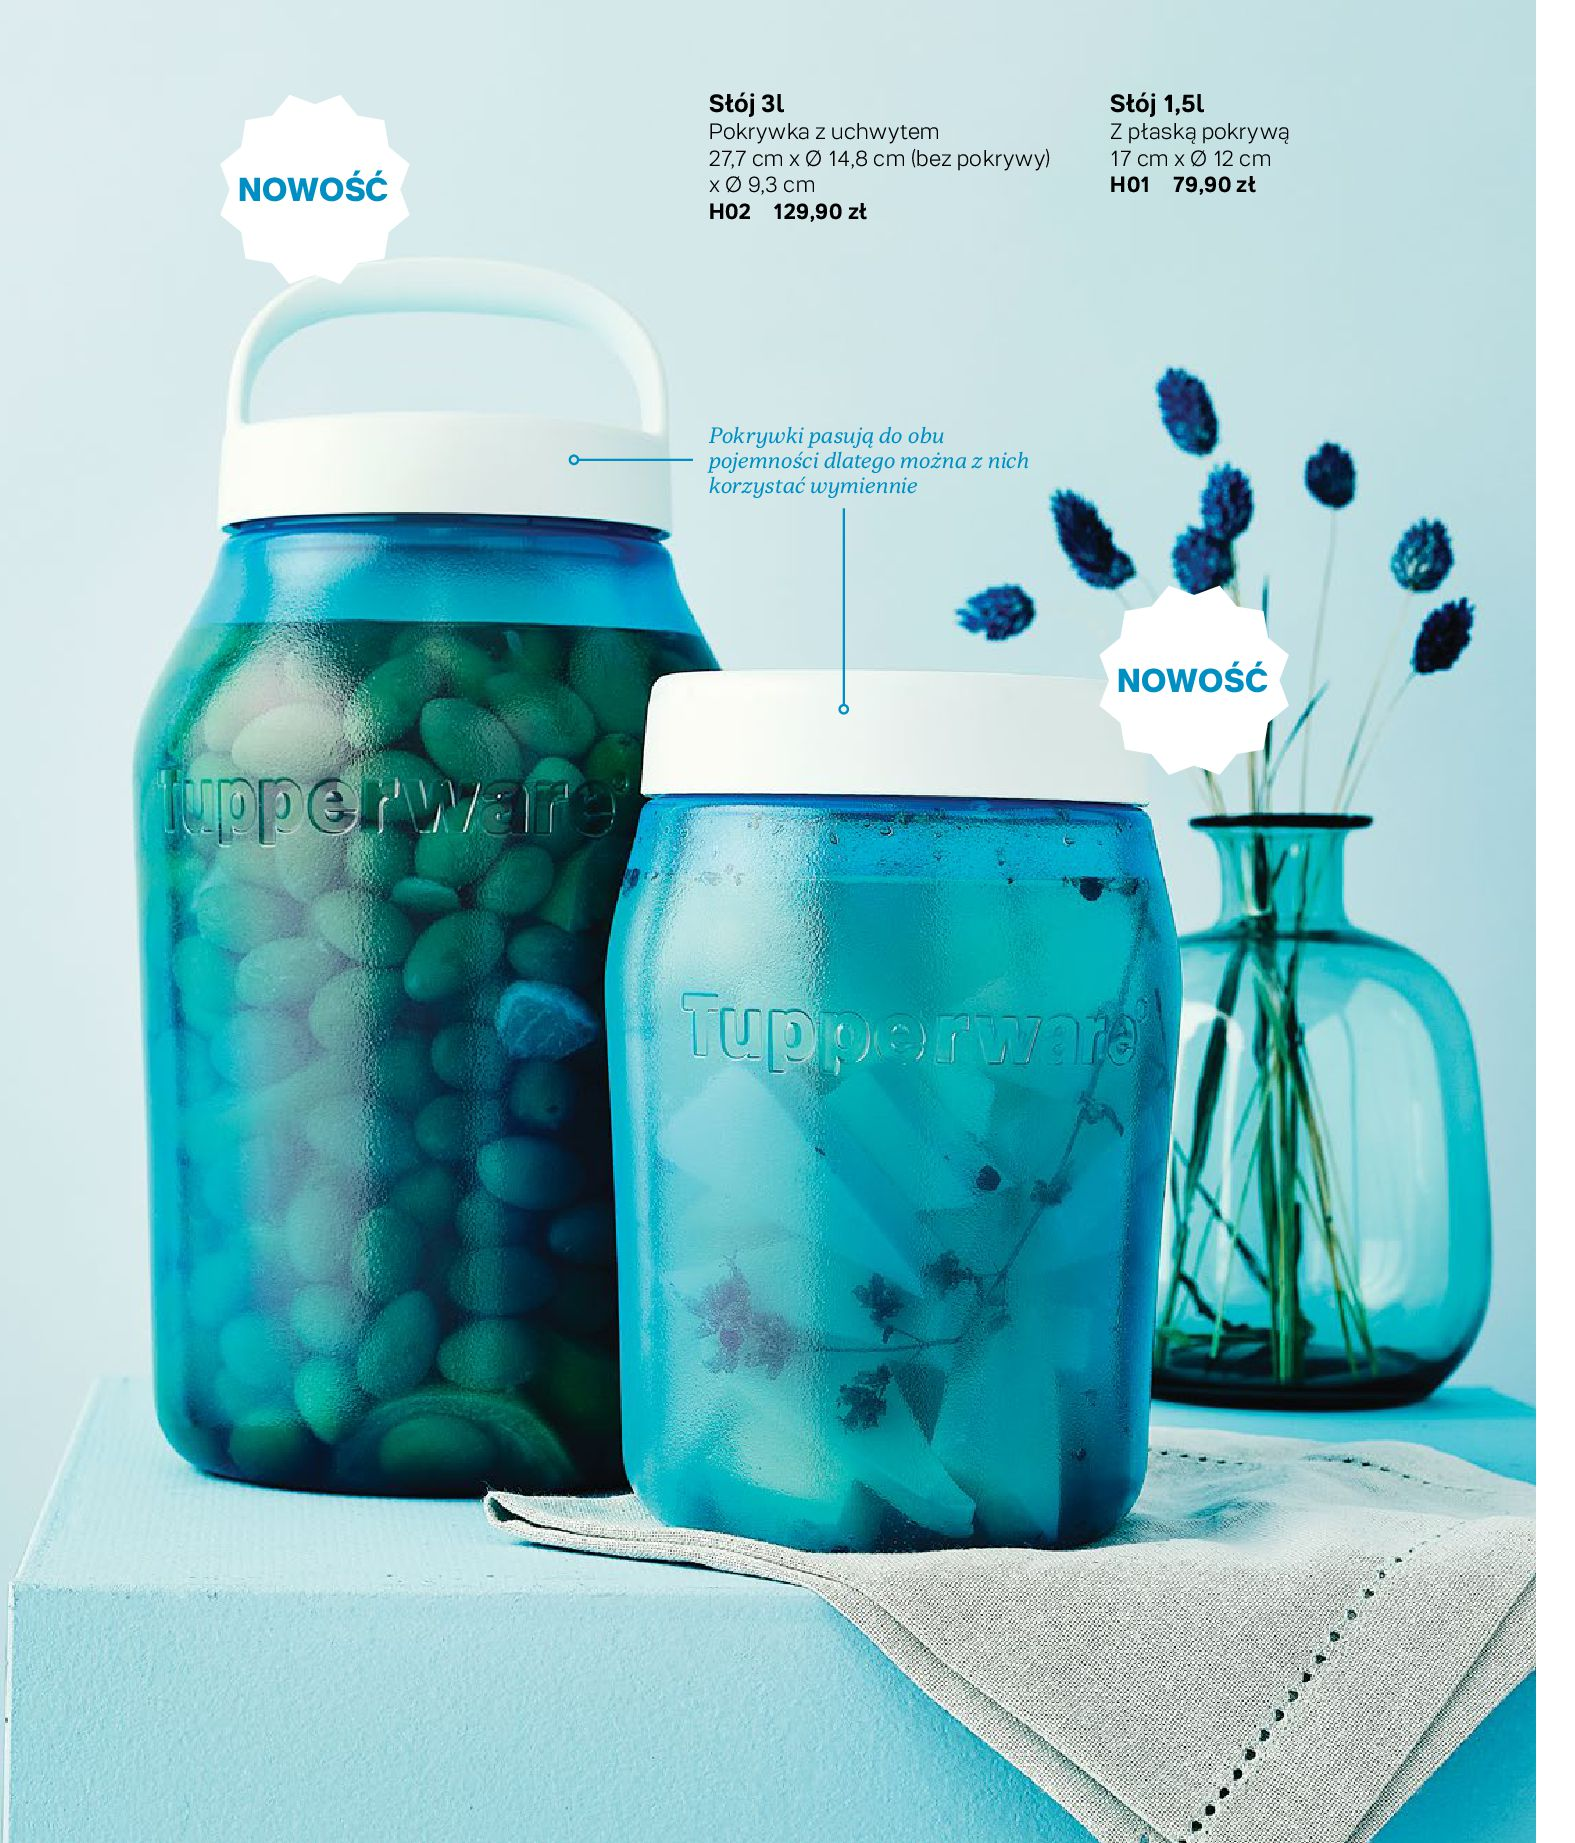 Gazetka Tupperware: Gazetka Tupperware - Katalog wiosna/ lato 2021-05-10 page-25